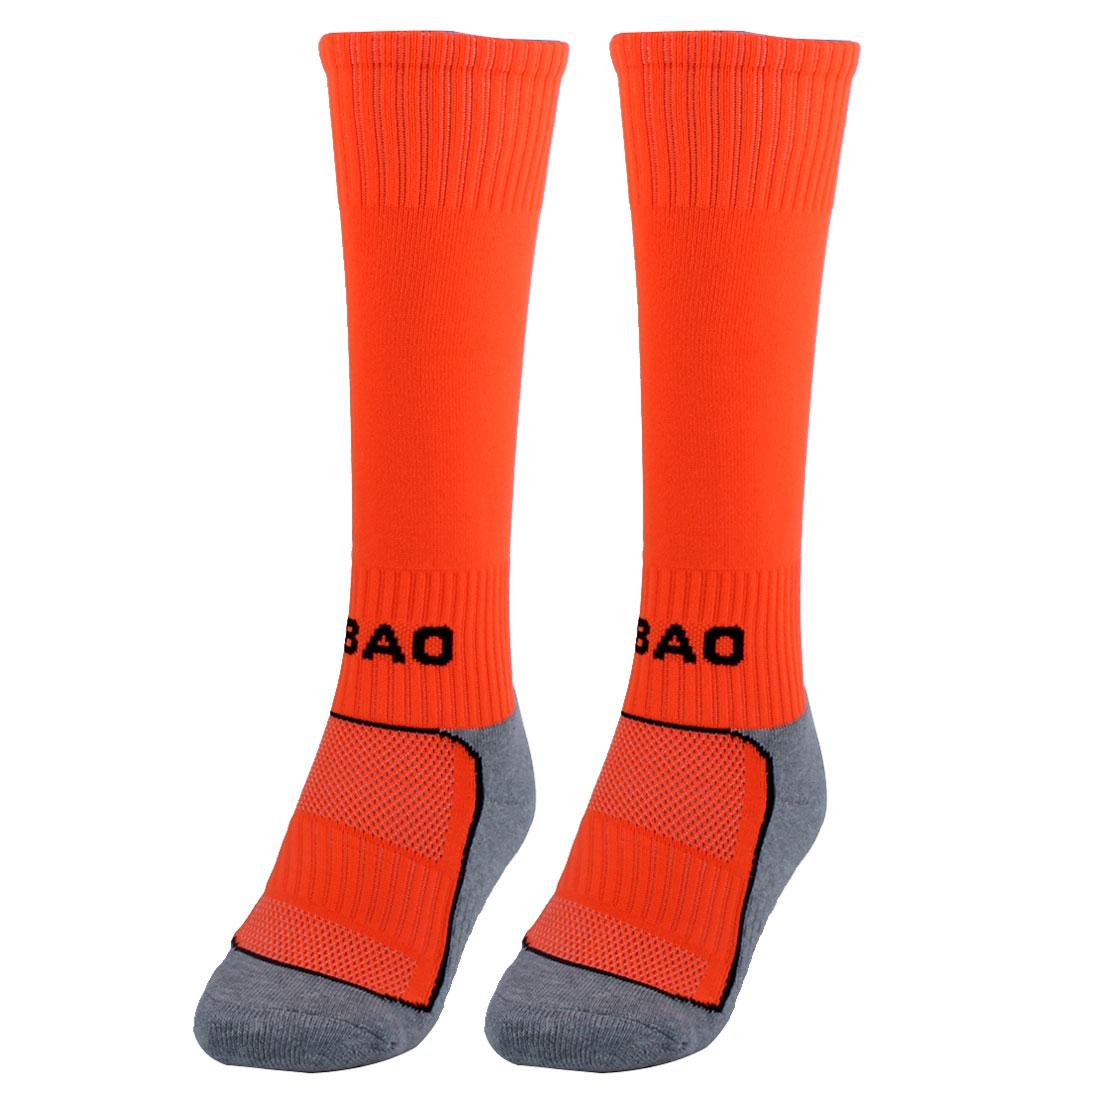 R-BAO Authorized Outdoor Sports Soccer Football Long Socks Orange Pair